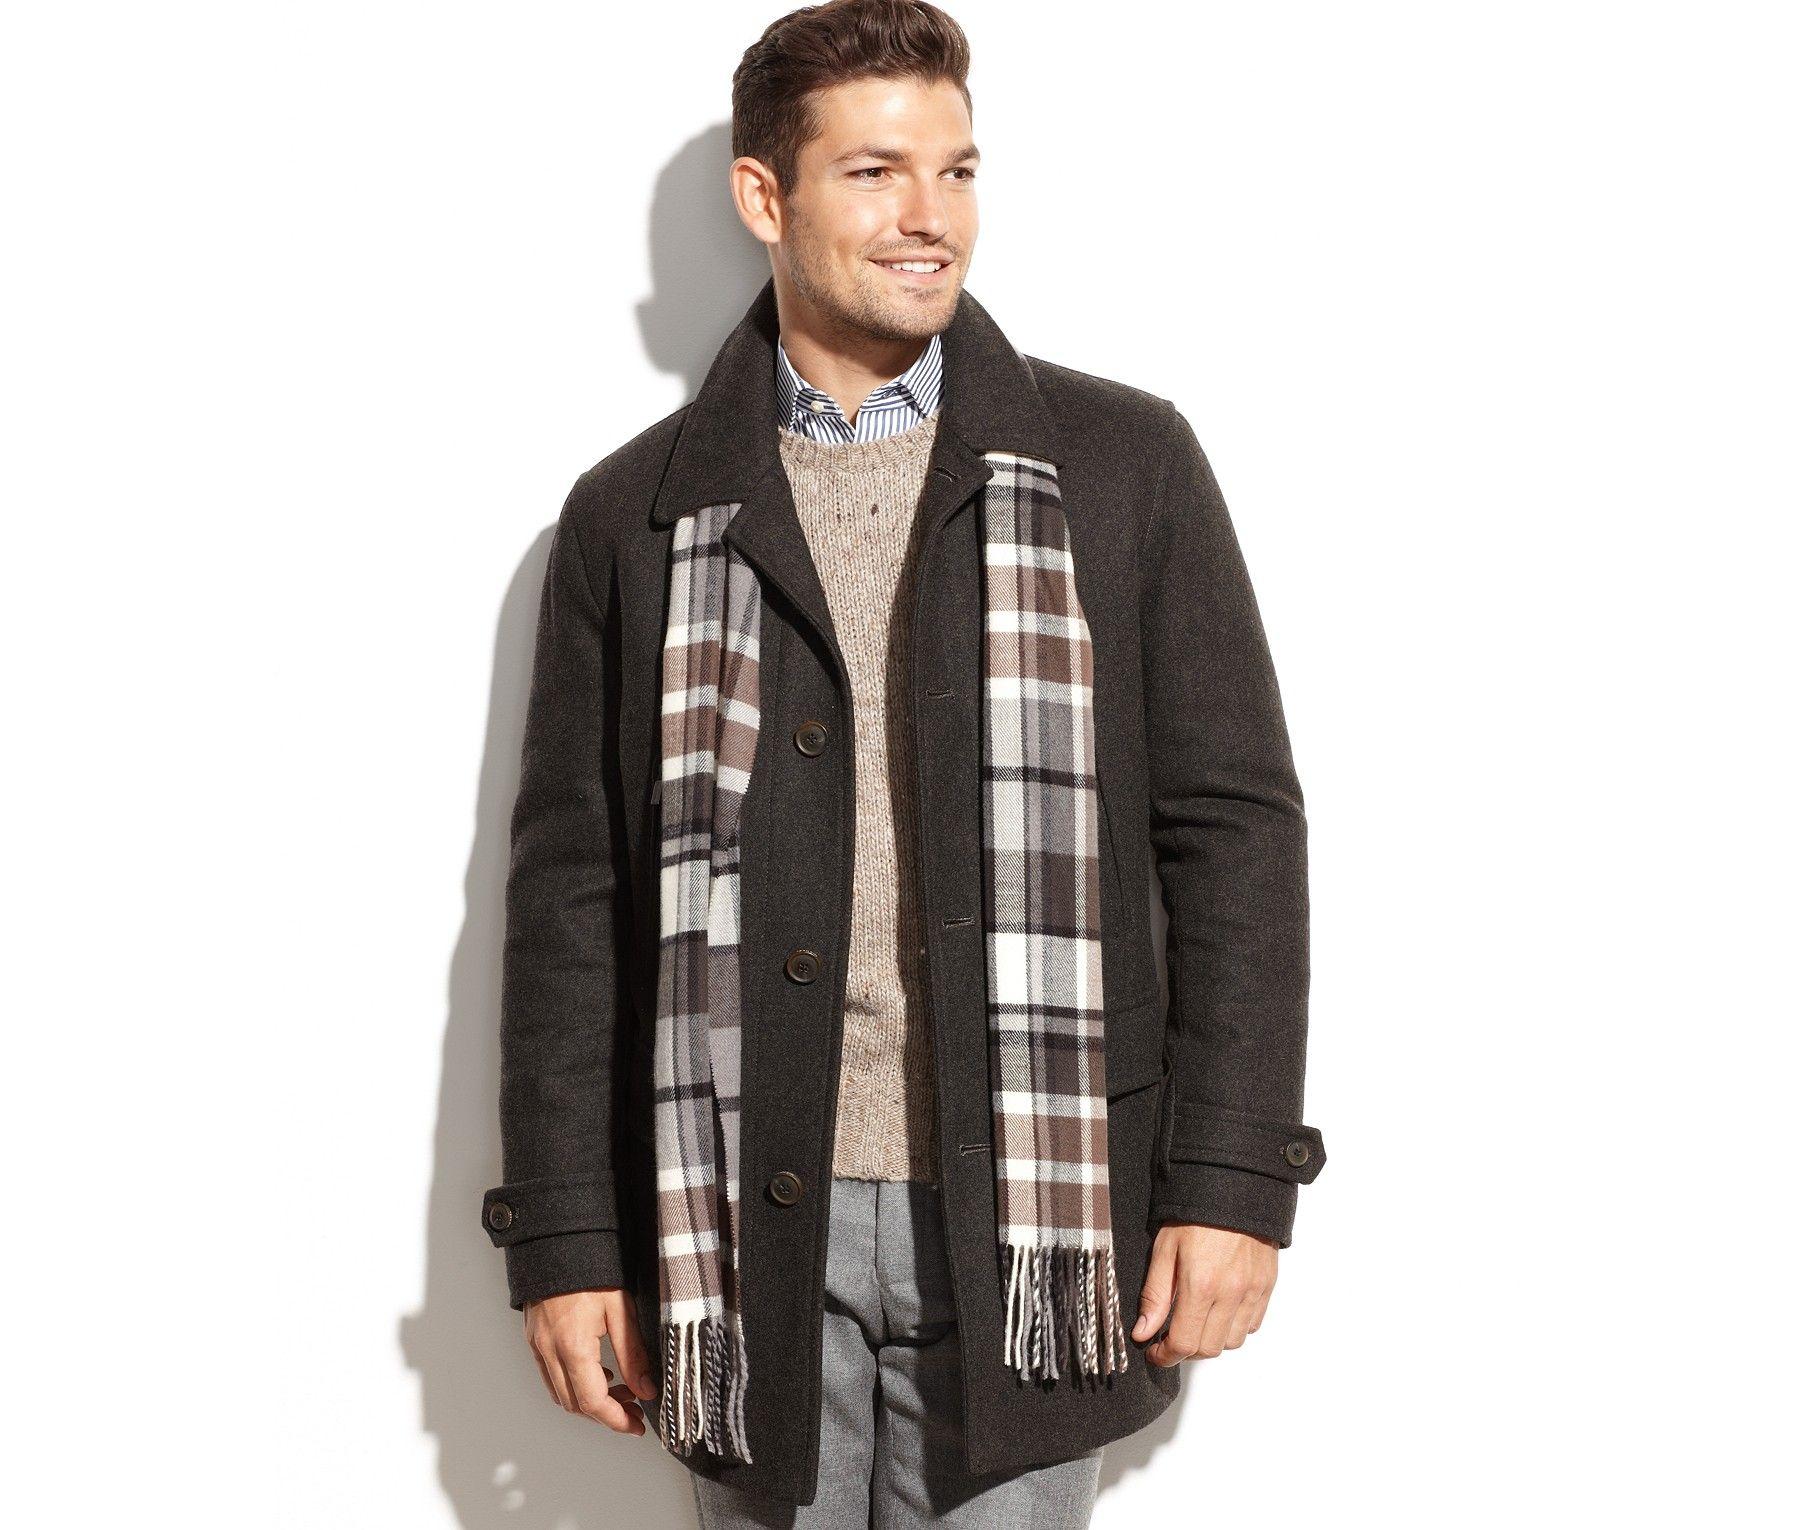 Michael Michael Kors Craig Wool-Blend Car Coat with Scarf - Coats & Jackets - Men - Macy's